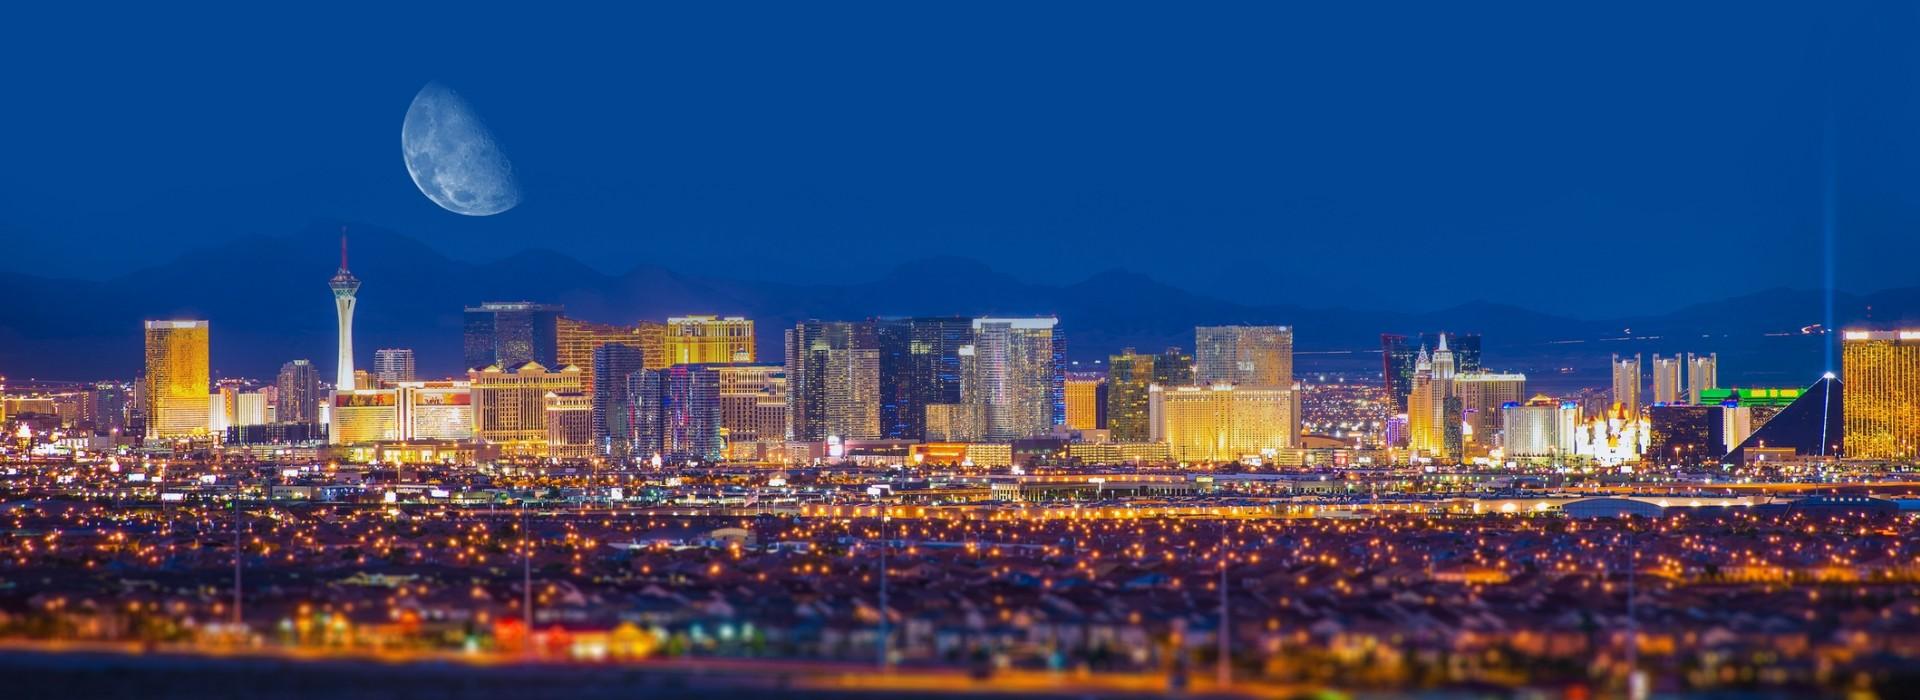 Travelling Las Vegas - Tours and Trips in Las Vegas